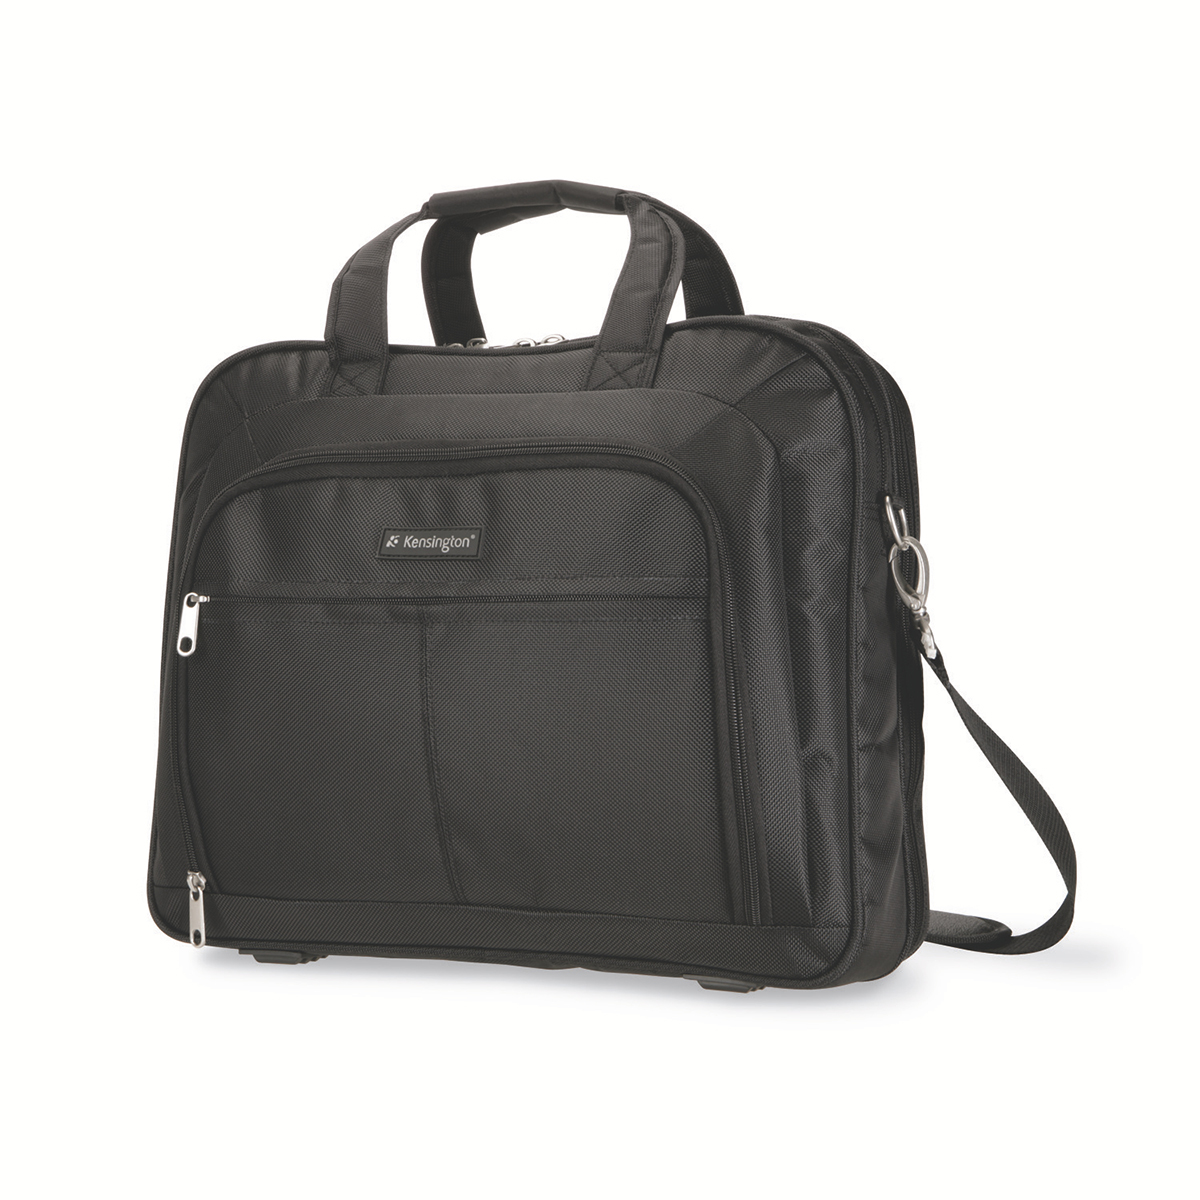 Kensington  K62564EU SP80 15.6 Inch Topload Case